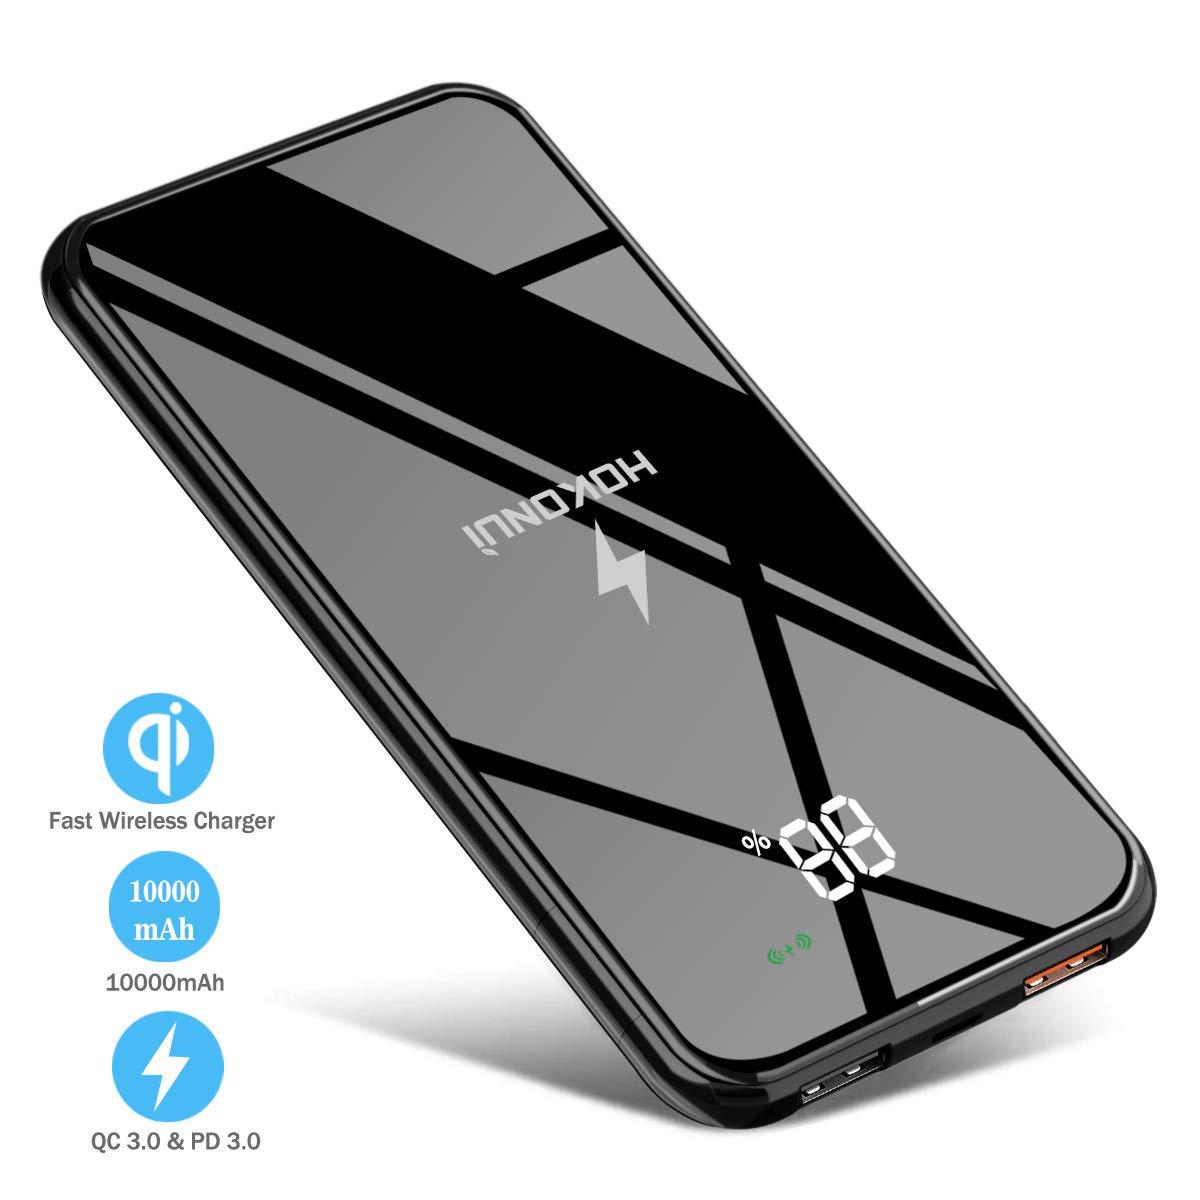 Wireless Portable Charger, Hokonui Wireless Power Bank 10000 mAh